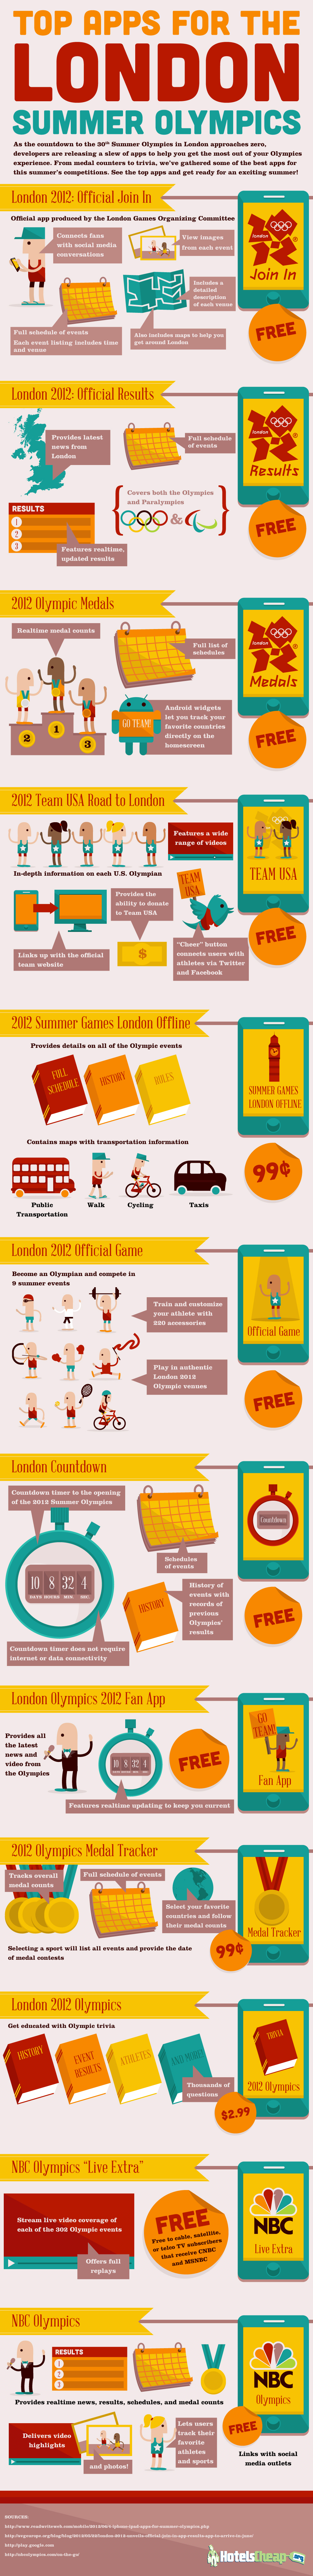 London 2012 Olympics Apps